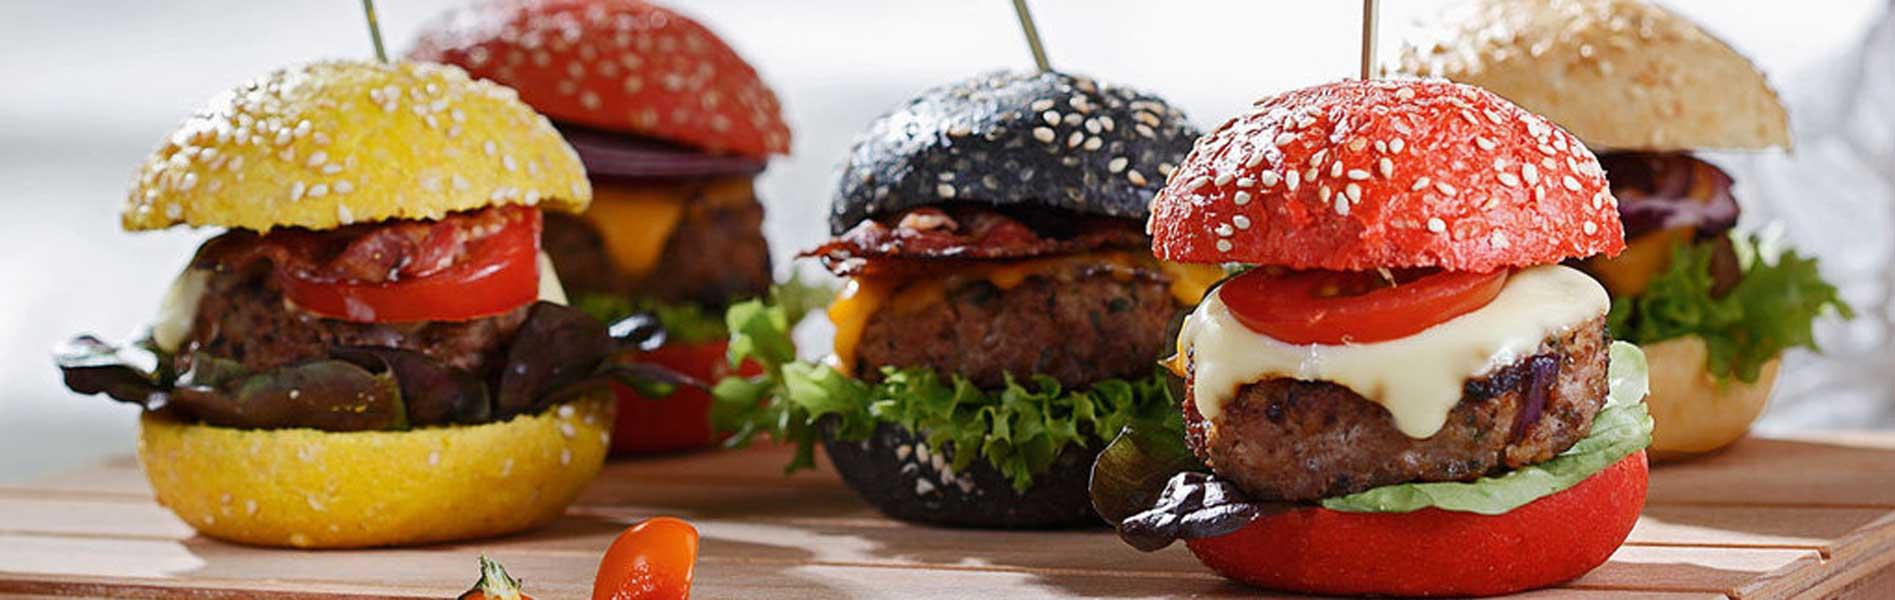 Bunte Mini Burger - Unikorn Catering München